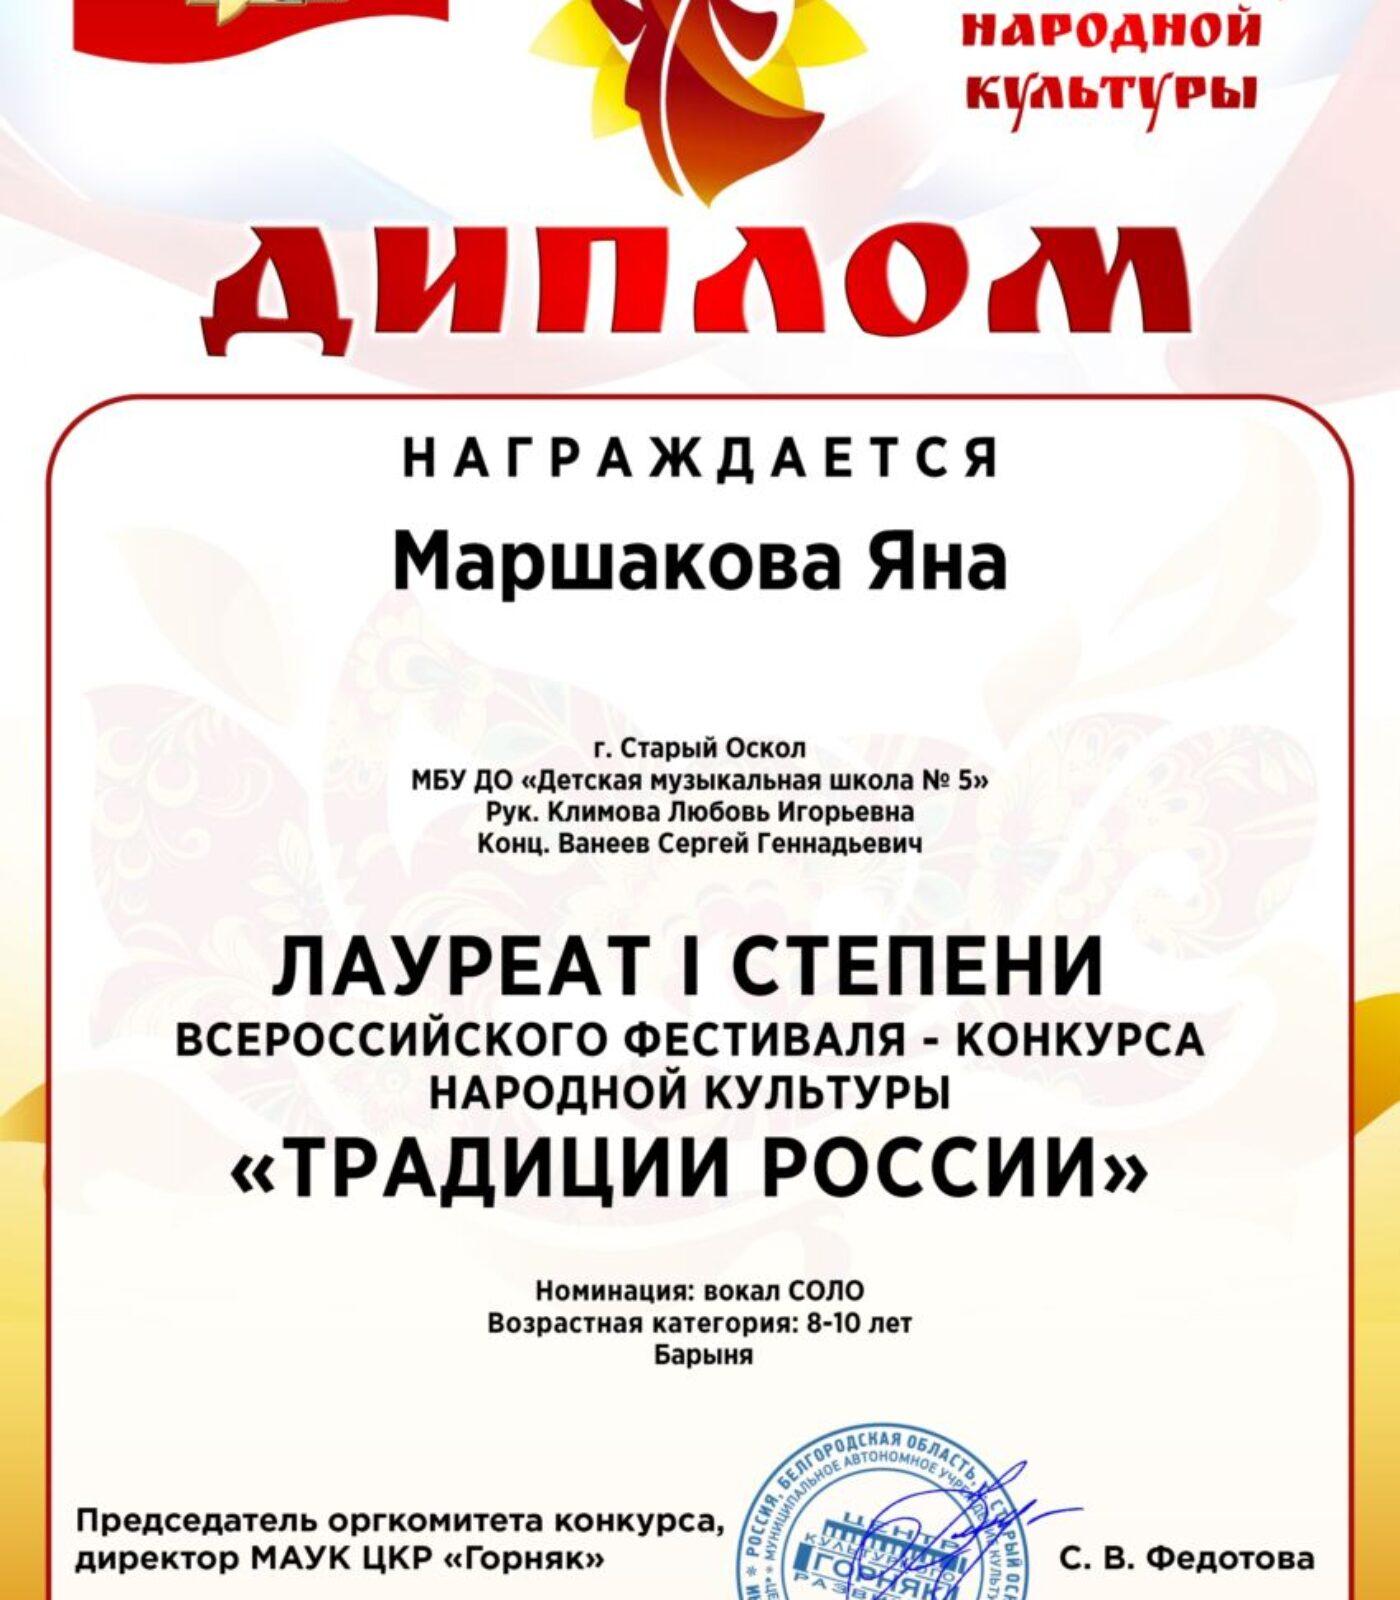 Маршакова Яна